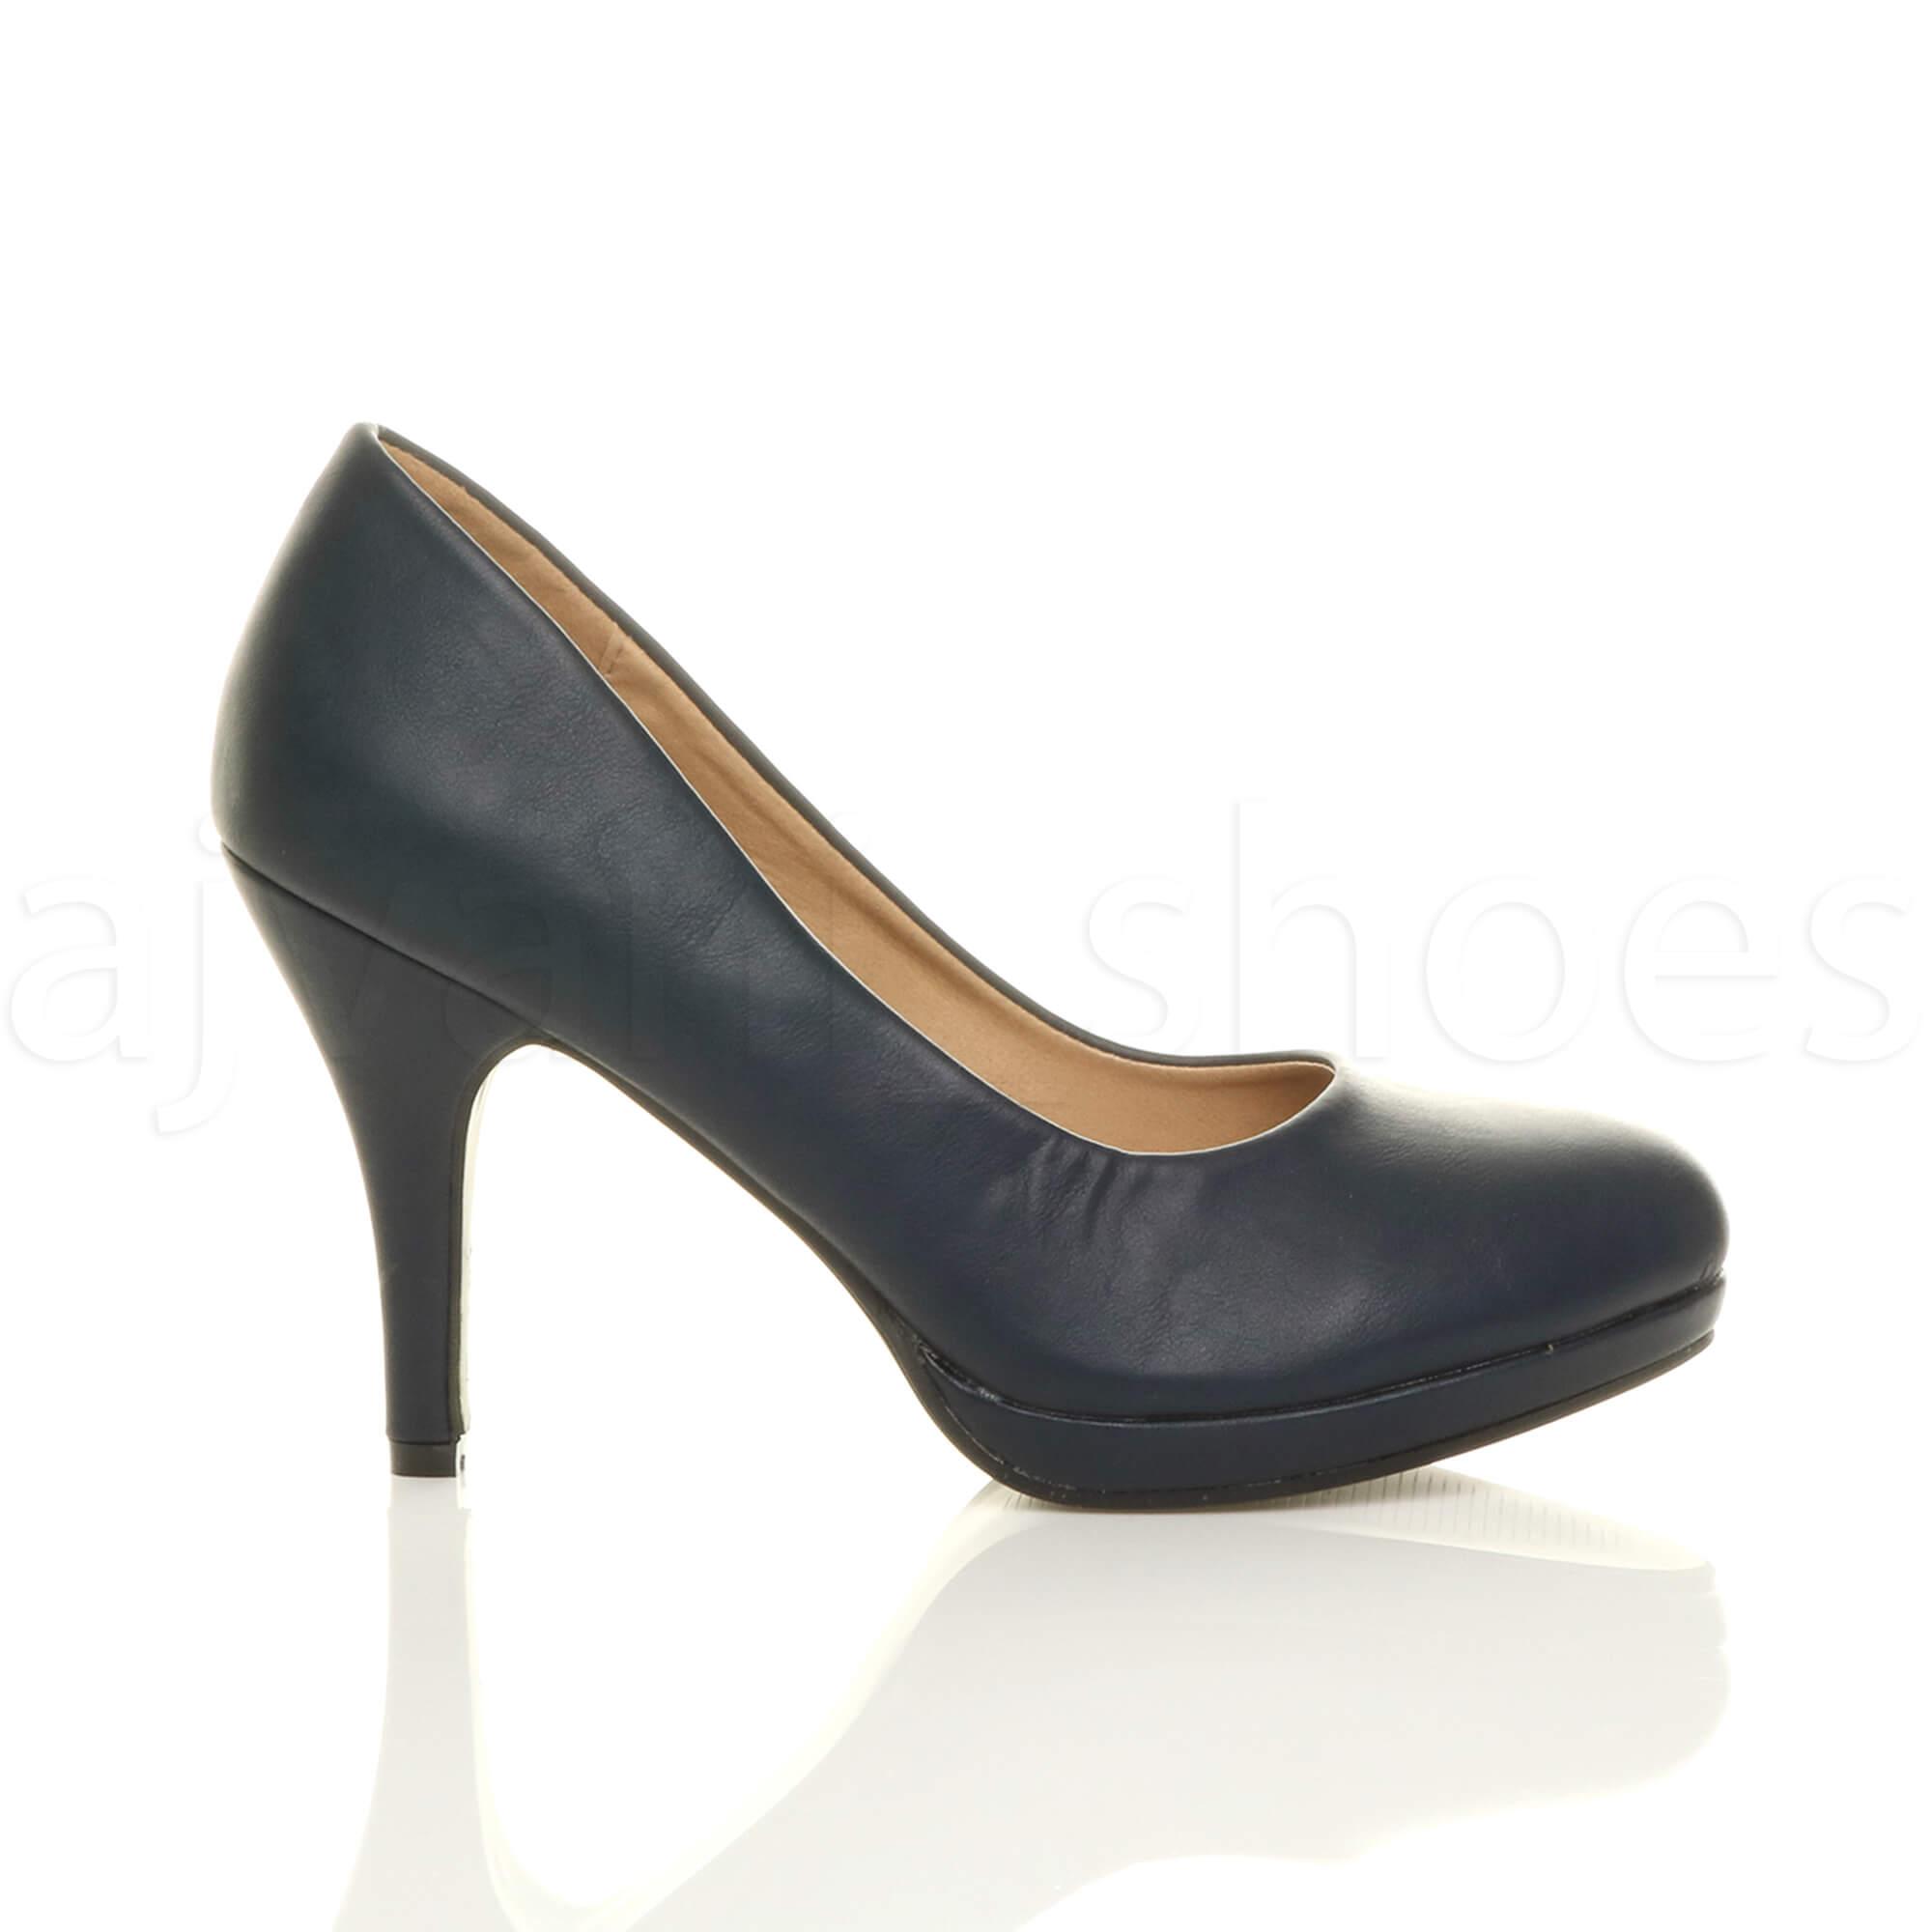 womens ladies mid high heel platform party work evening court shoes pumps size ebay. Black Bedroom Furniture Sets. Home Design Ideas